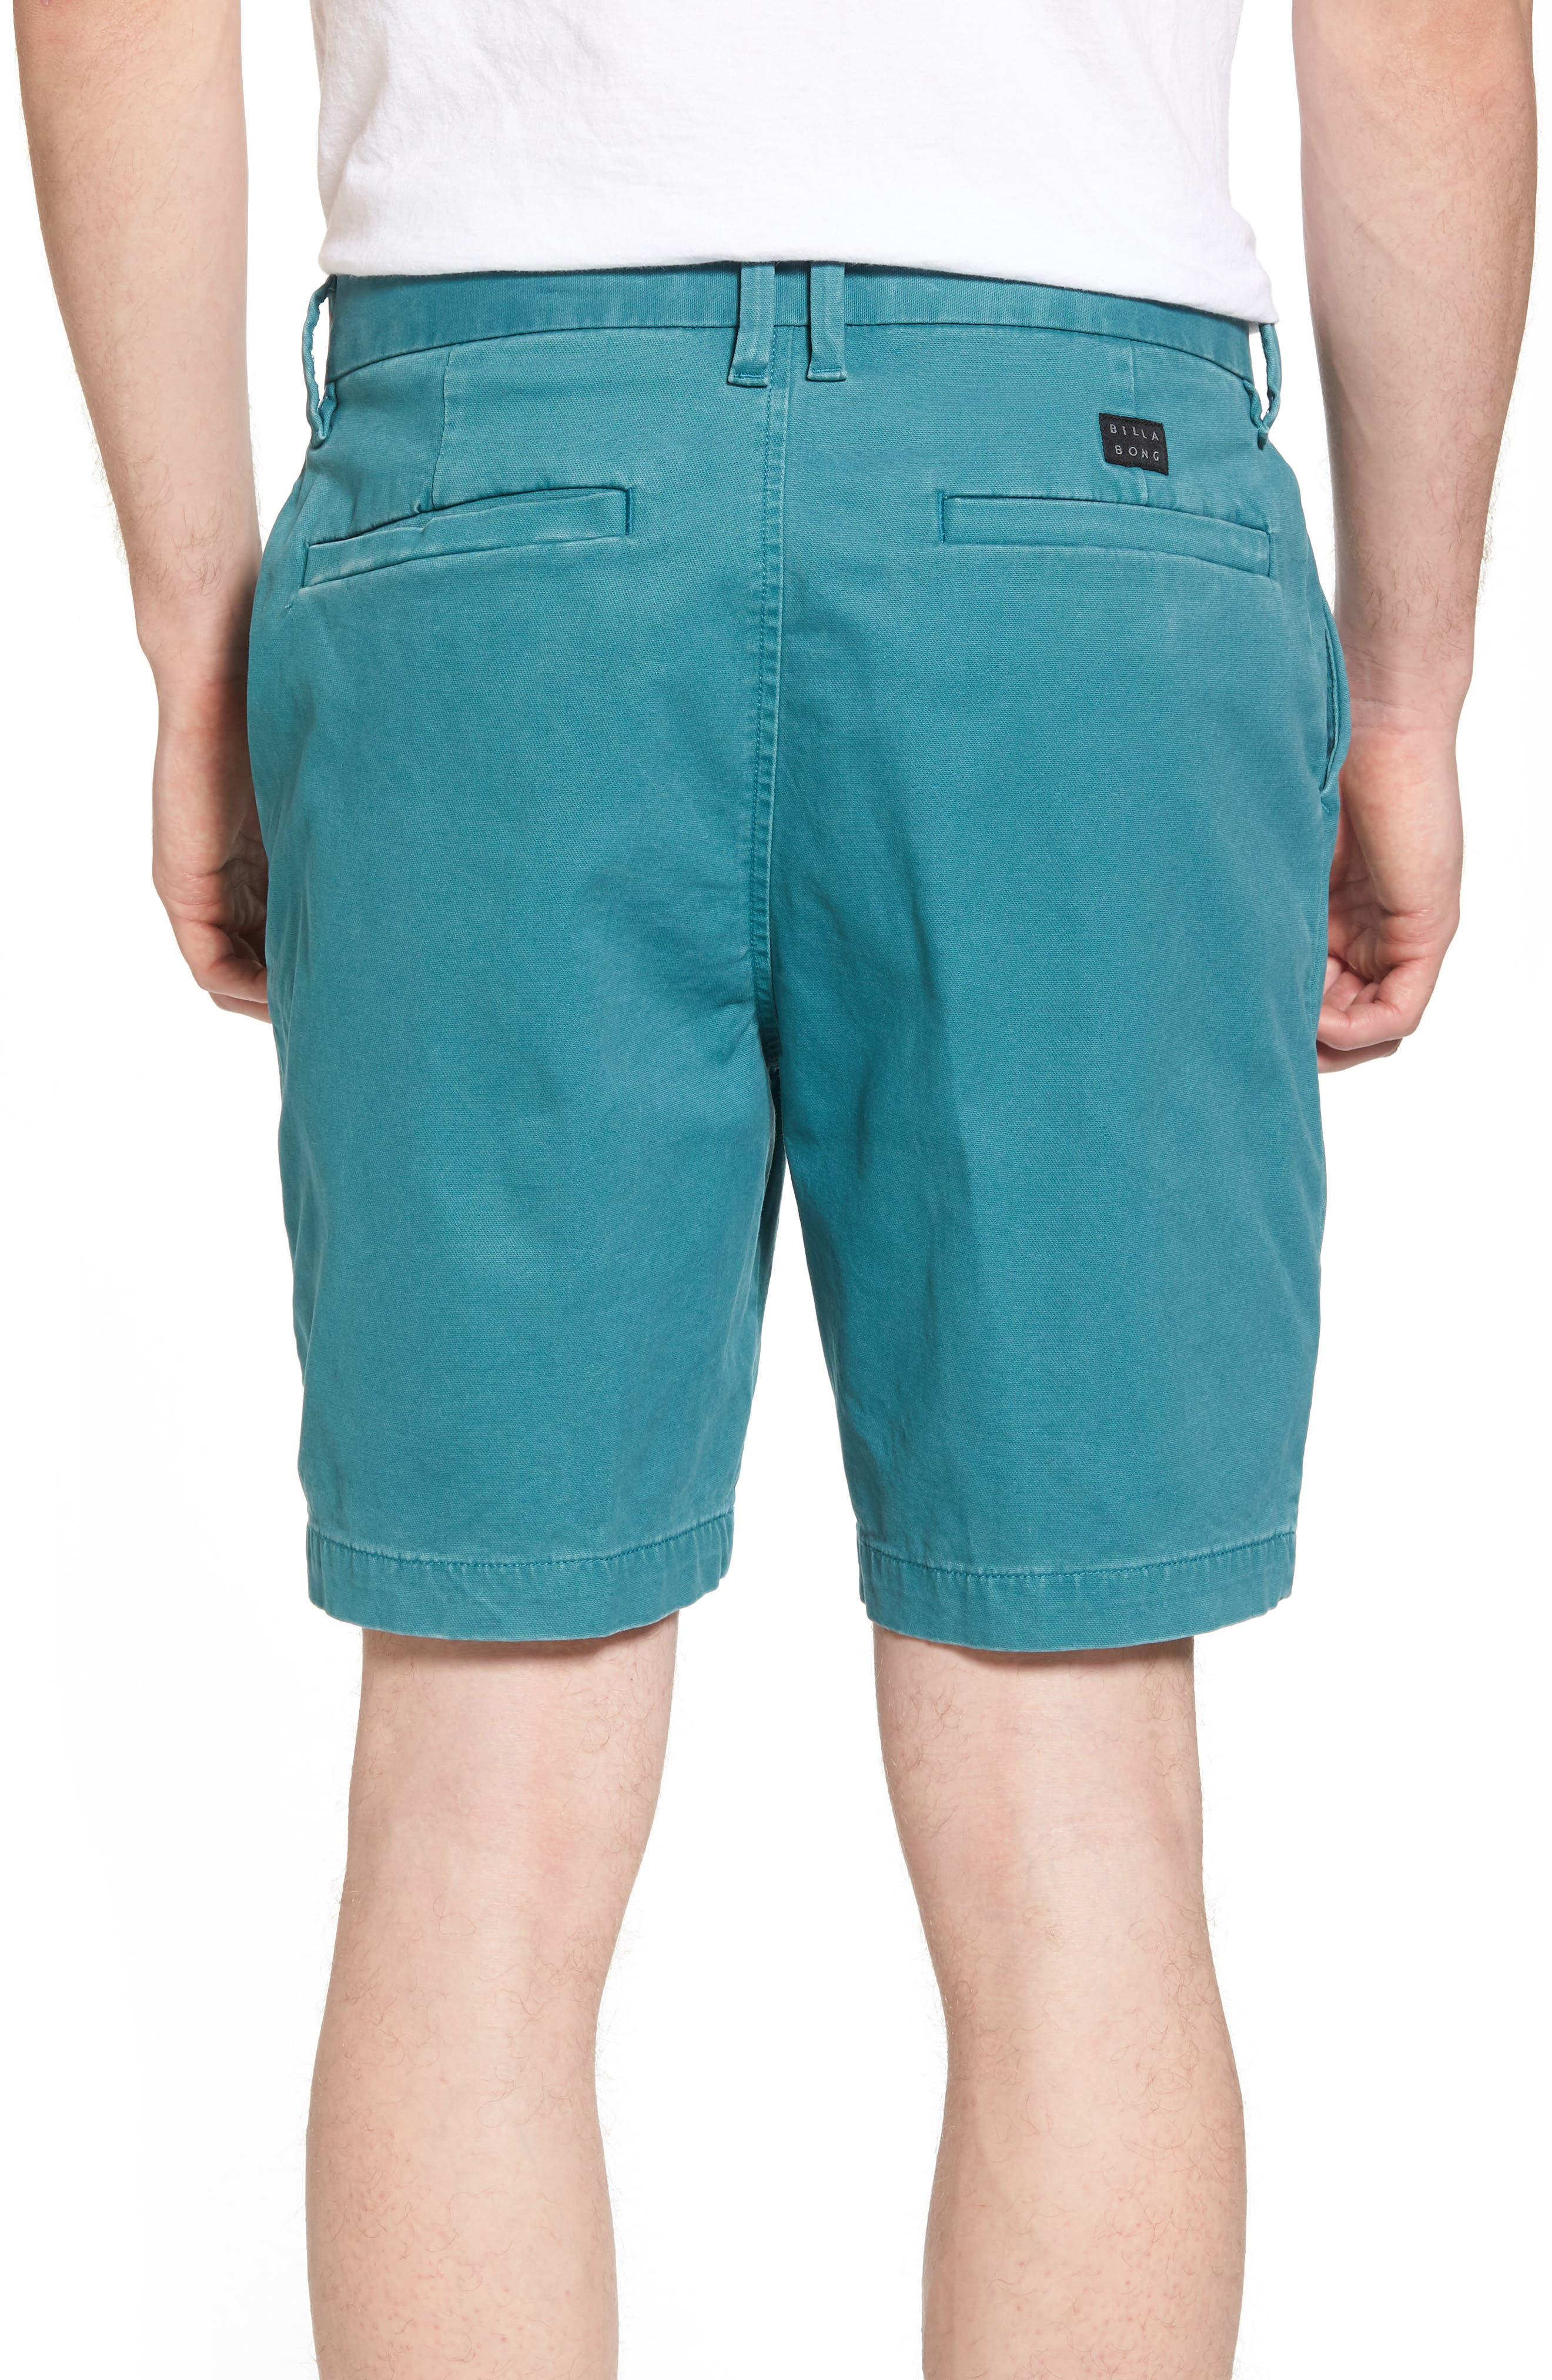 New Order Shorts,                             Alternate thumbnail 2, color,                             Hydro